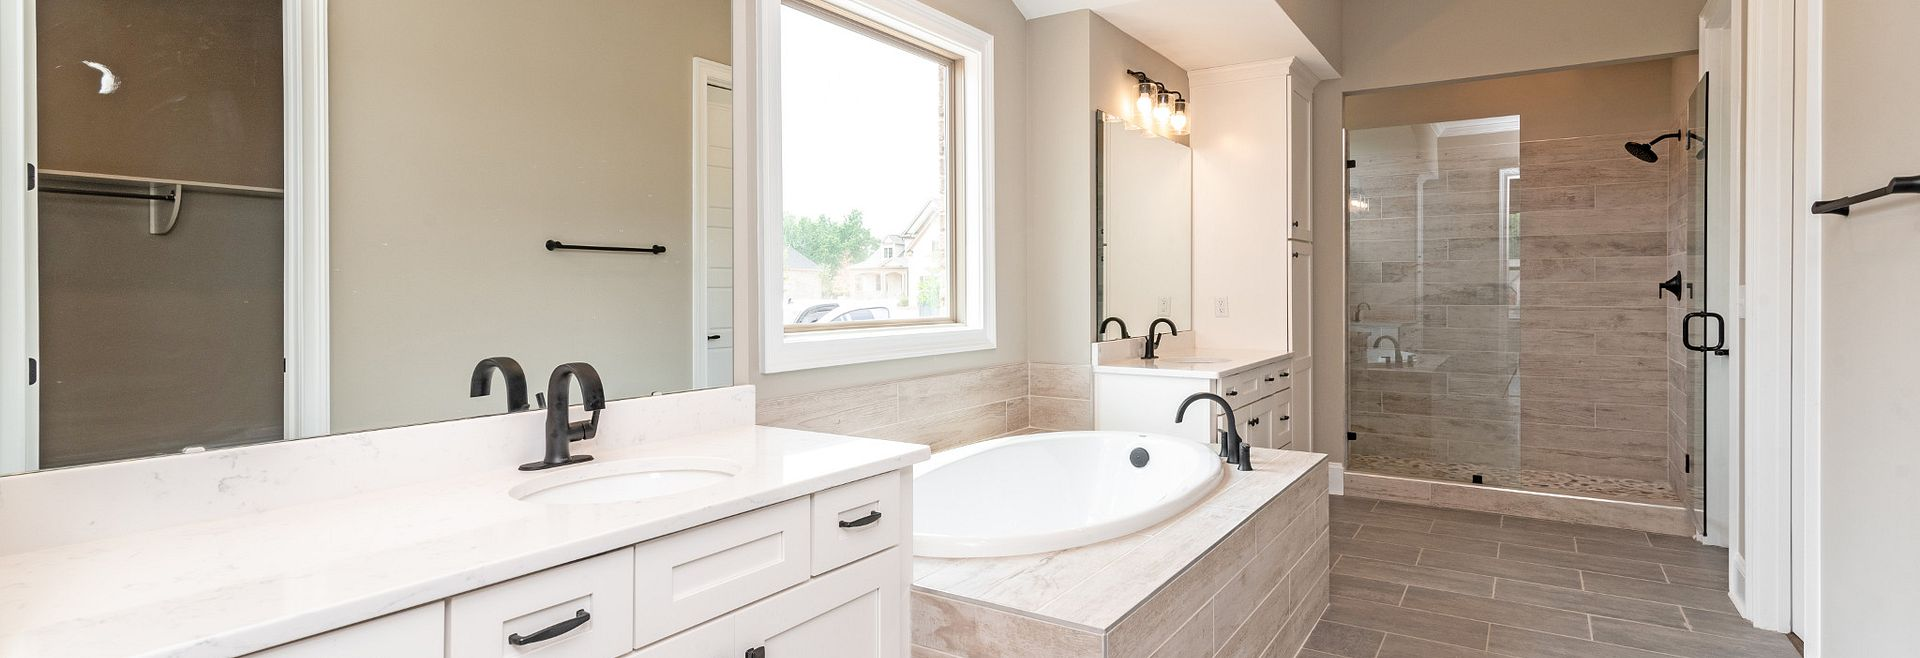 Kingsley plan Owner's Bath